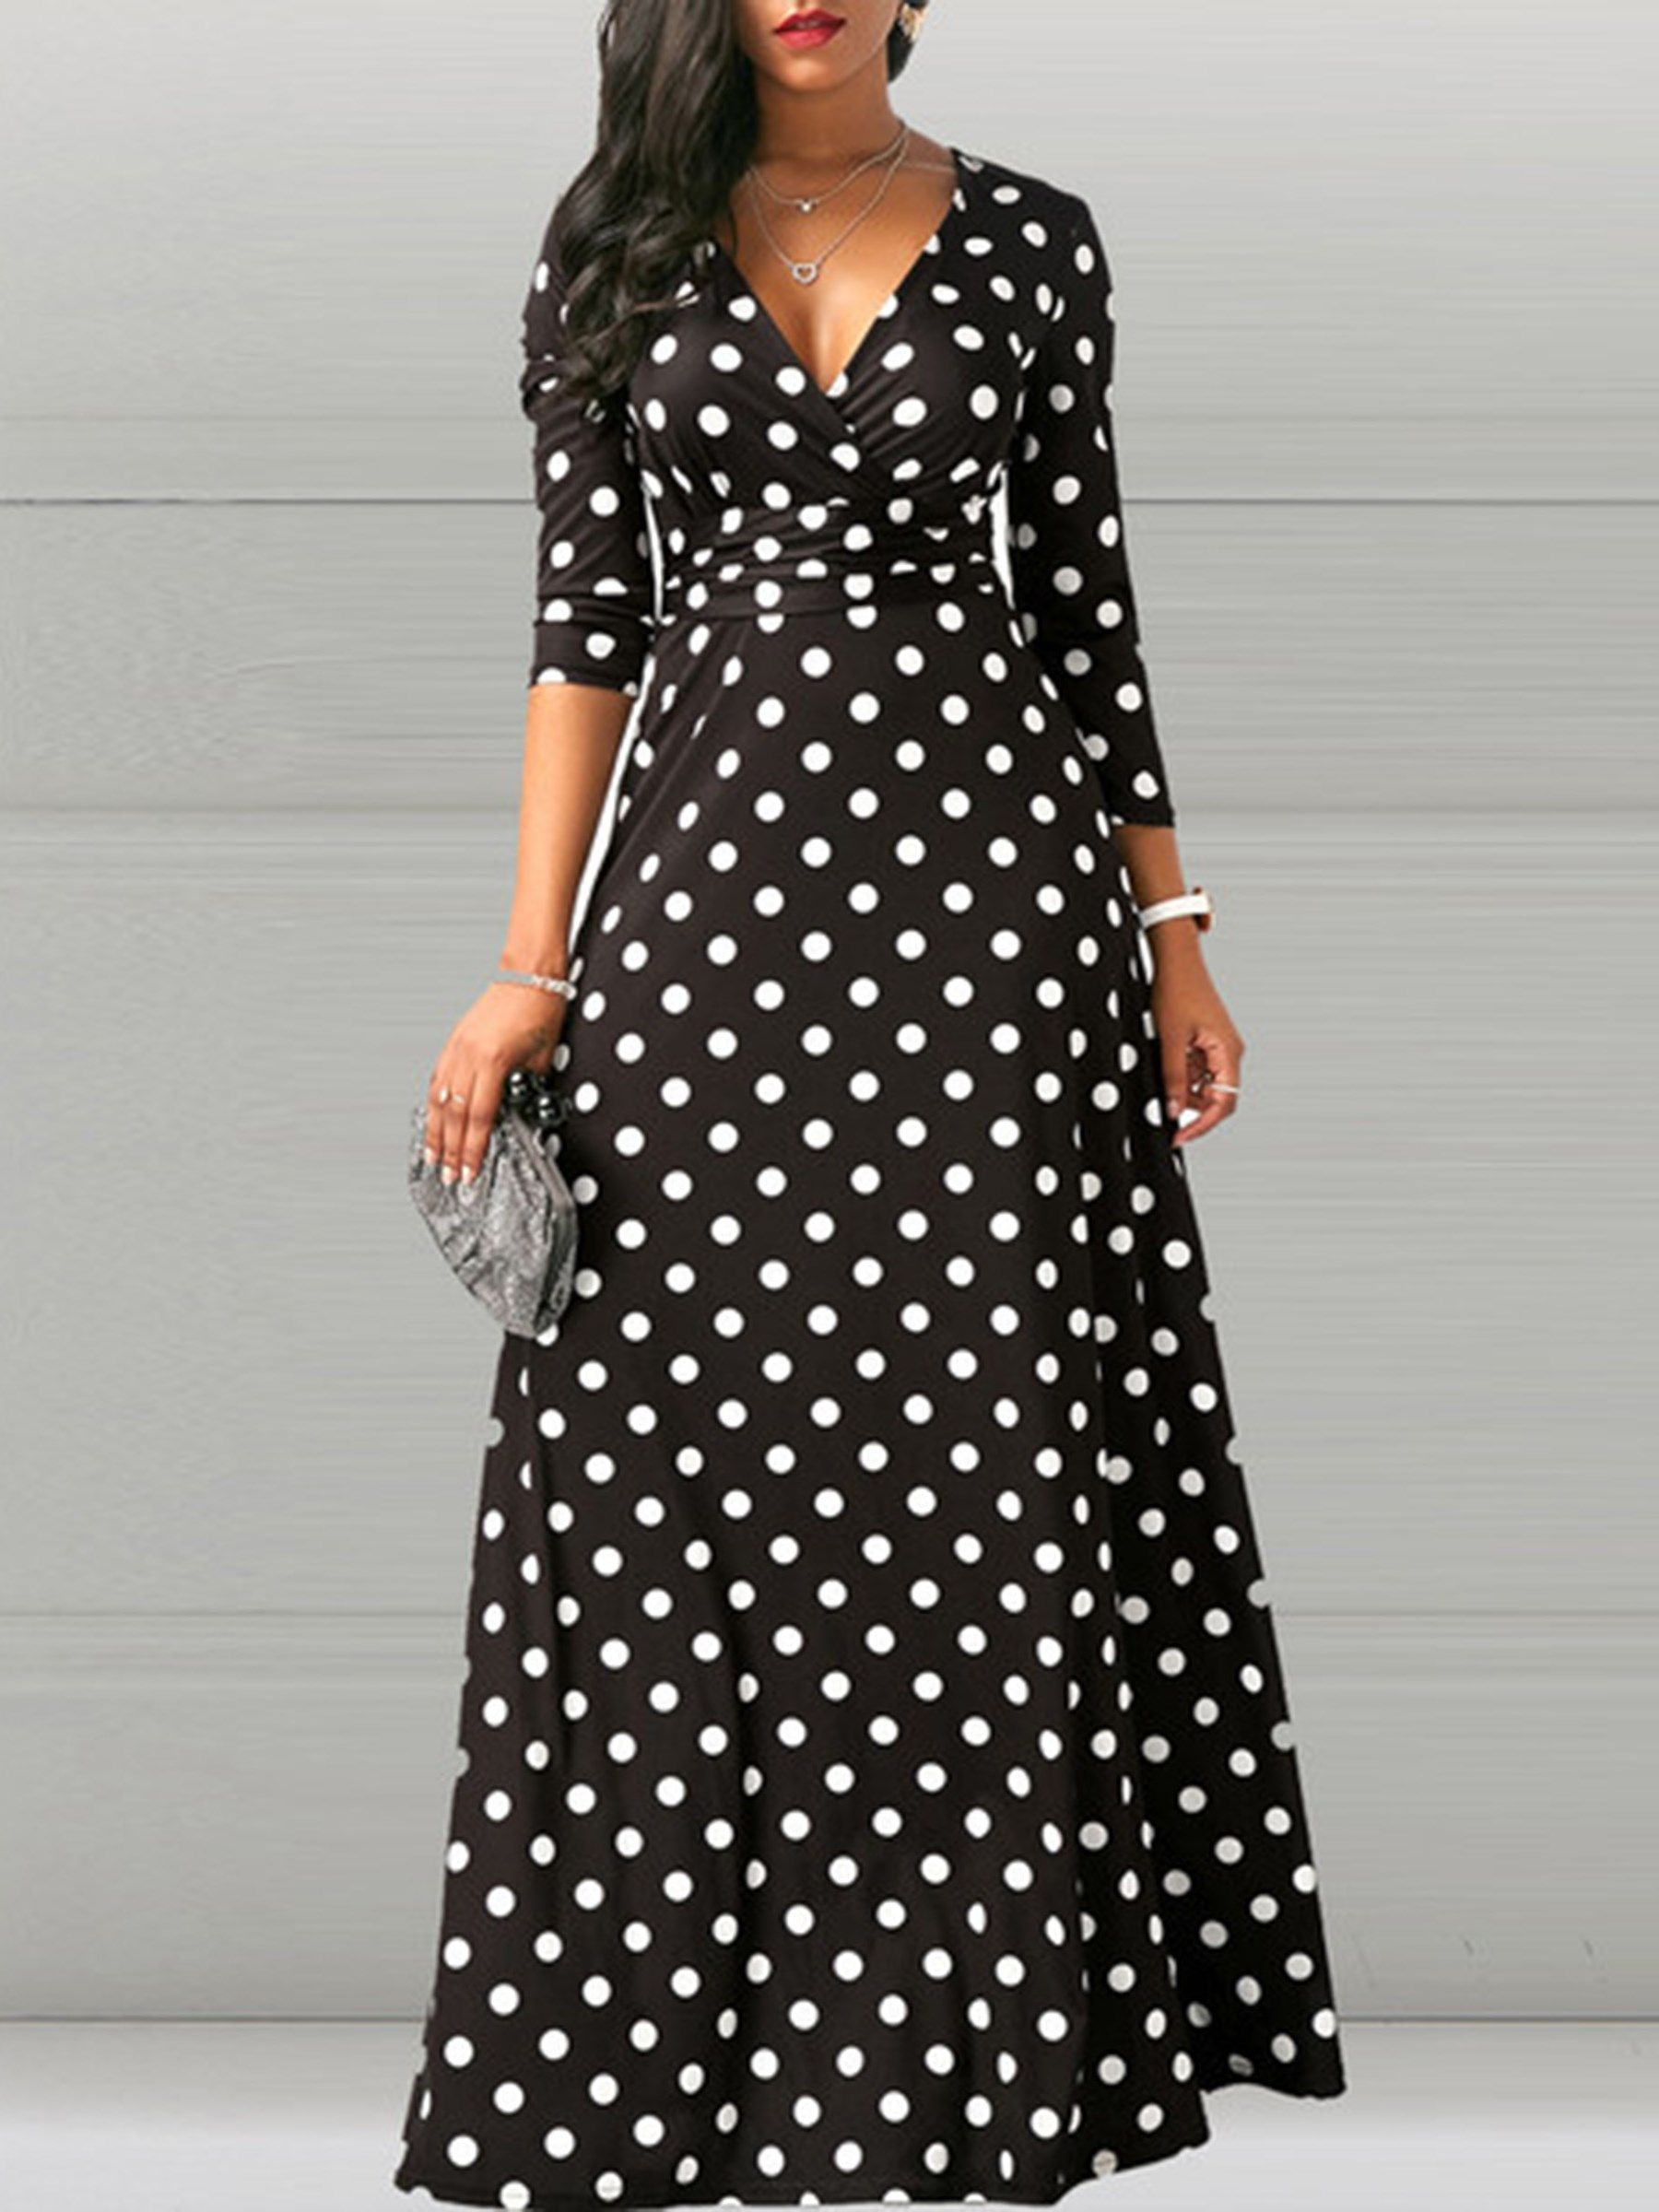 Long Sleeve Cotton Color Block Women S Maxi Dress Maxi Dress Long Dress Outfits Women Long Sleeve Dress [ 2400 x 1800 Pixel ]